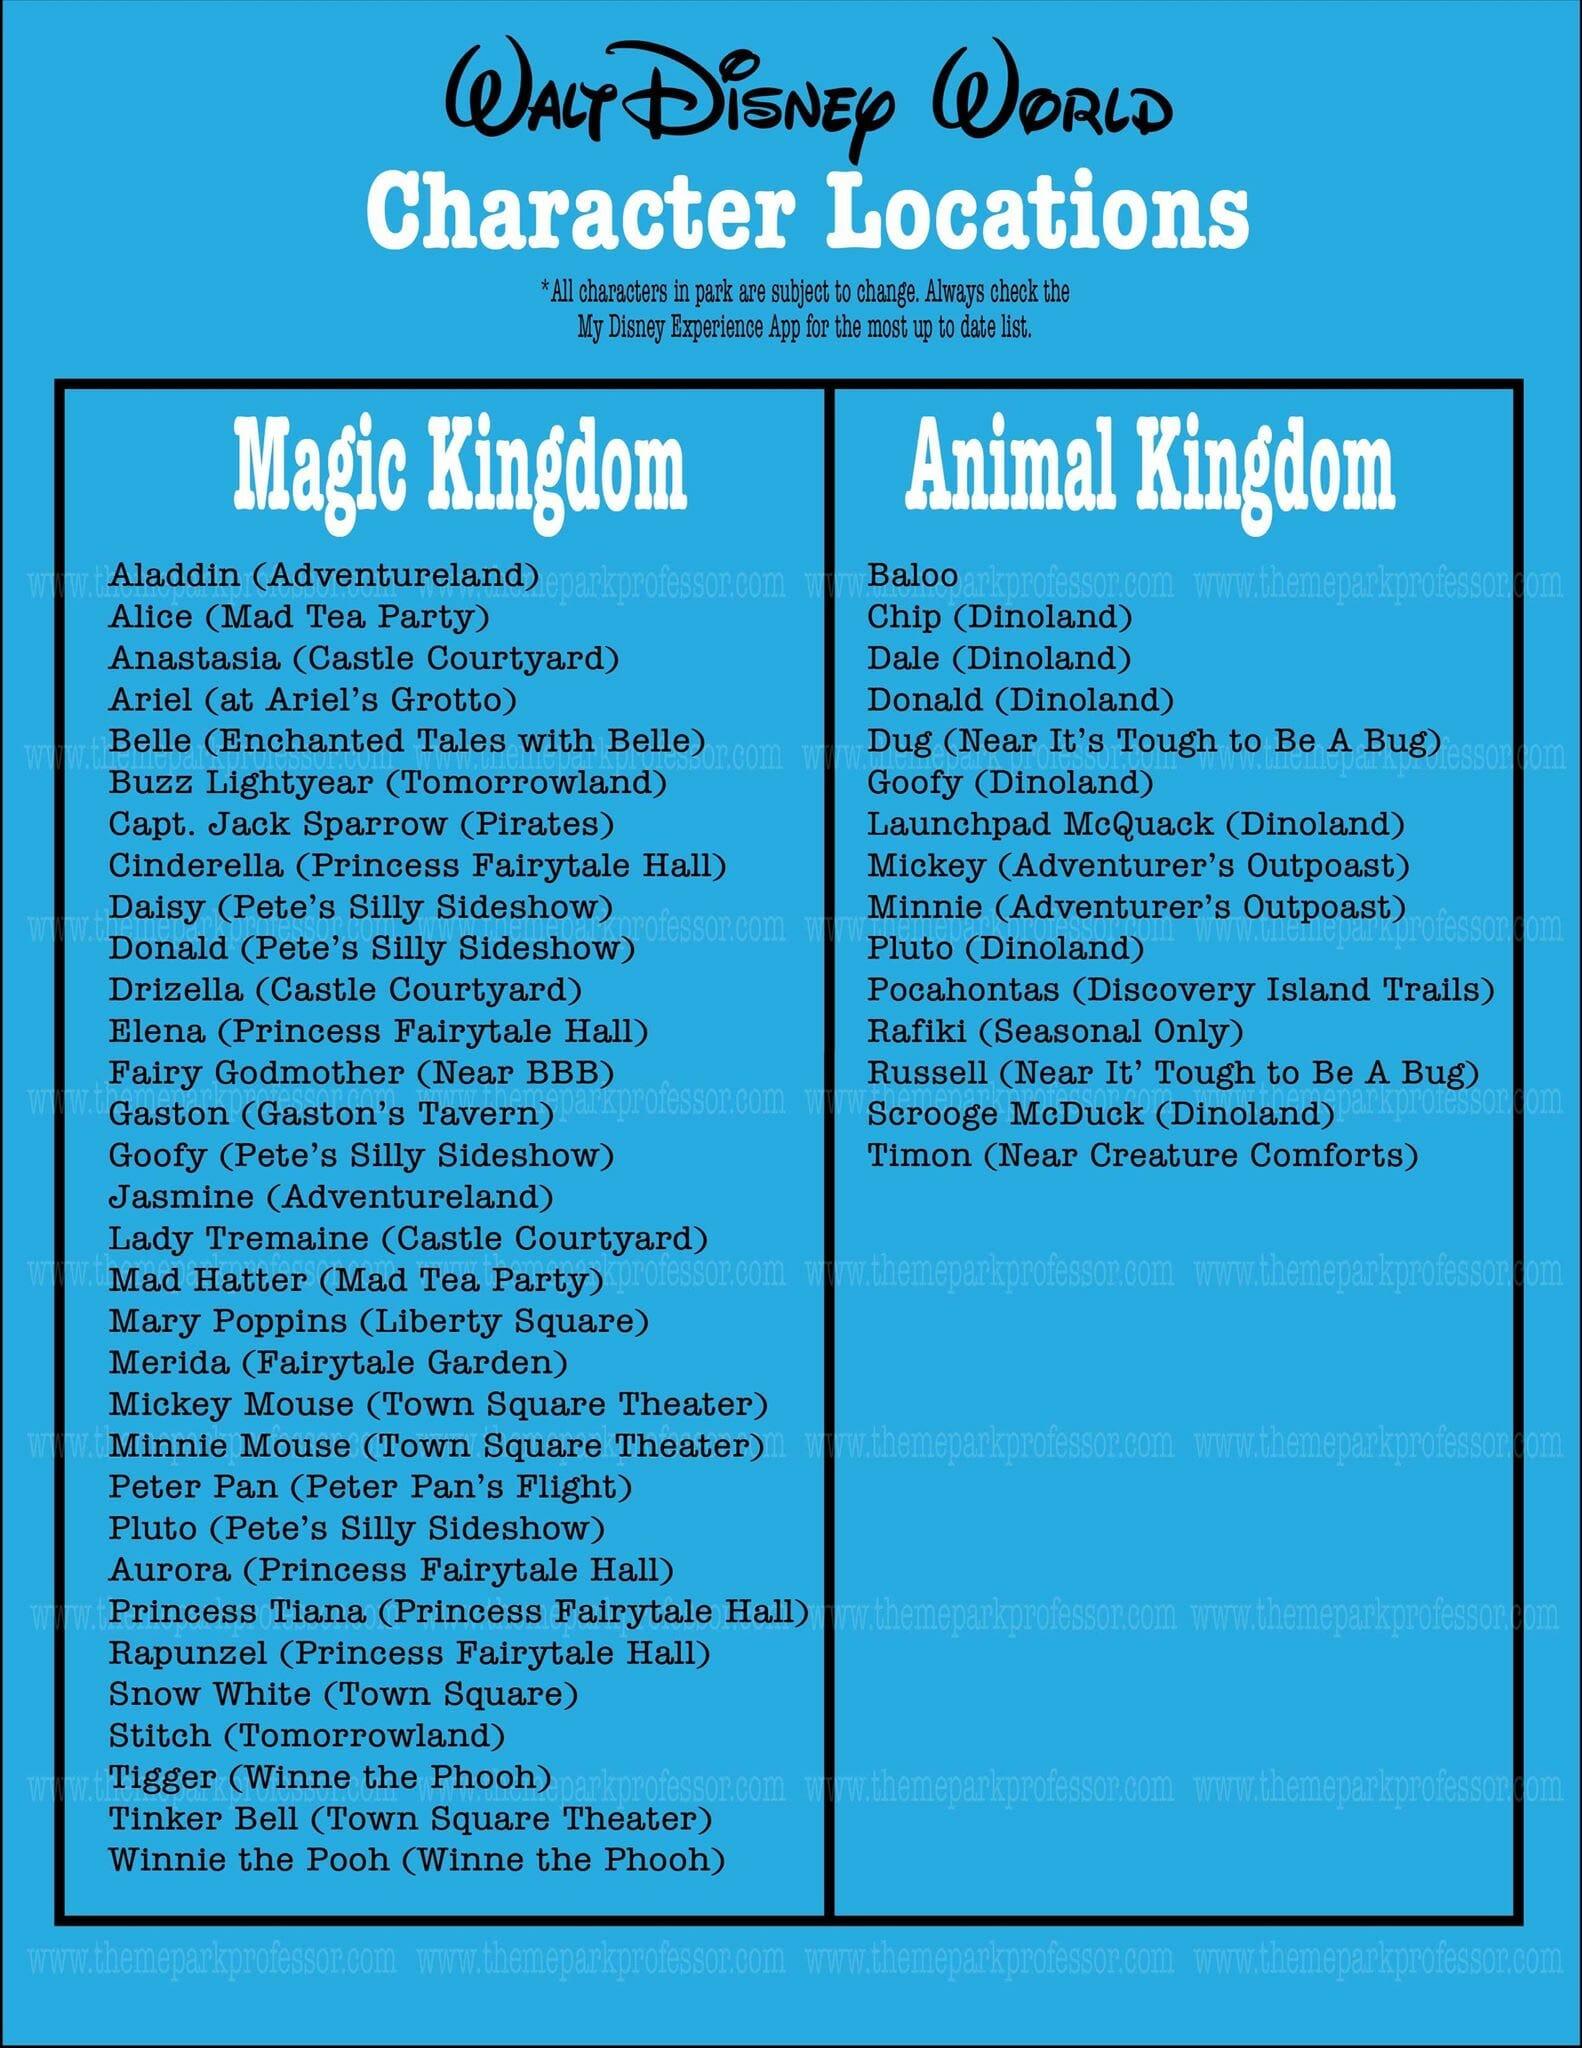 Walt Disney World Printable Character Guide - Theme Park